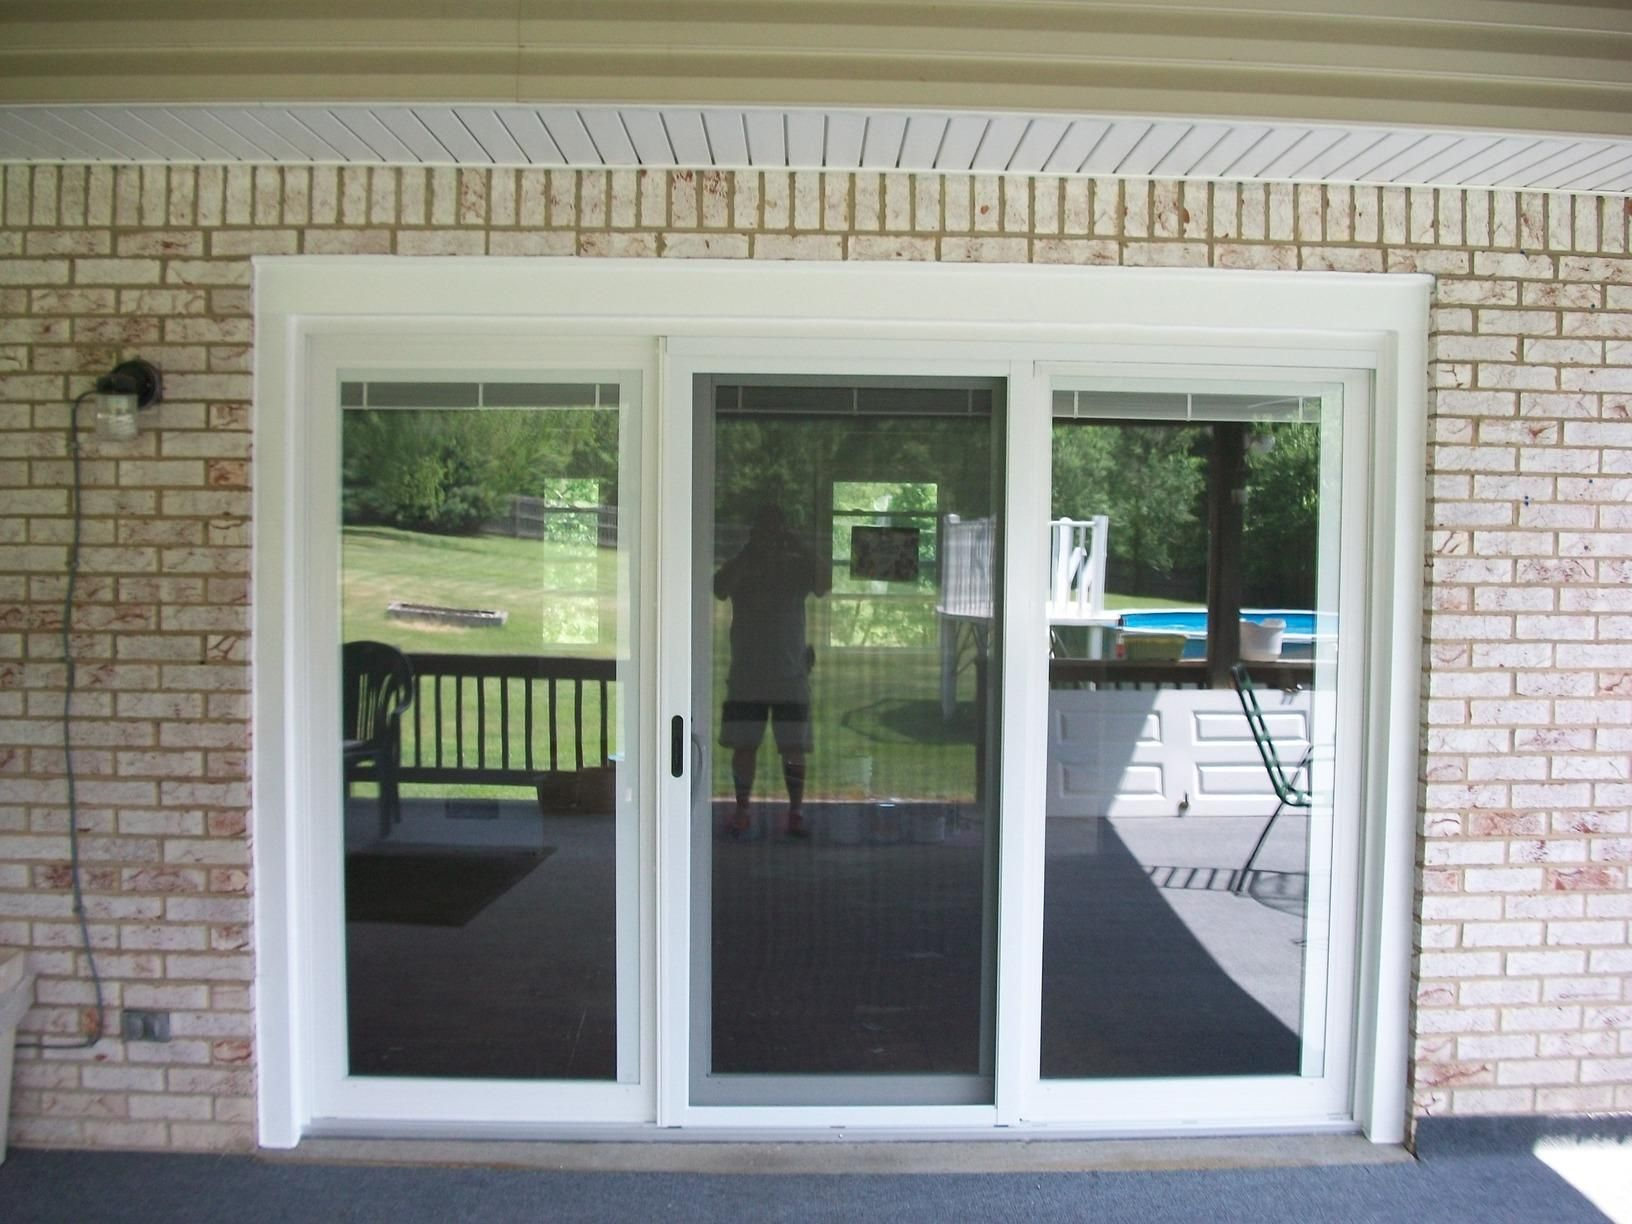 Energy Swing Windows Replacement Doors Three Panel Sliding Glass Door Installed In Apollo Pa Replacement Patio Doors Wooden Patio Doors Glass Doors Patio